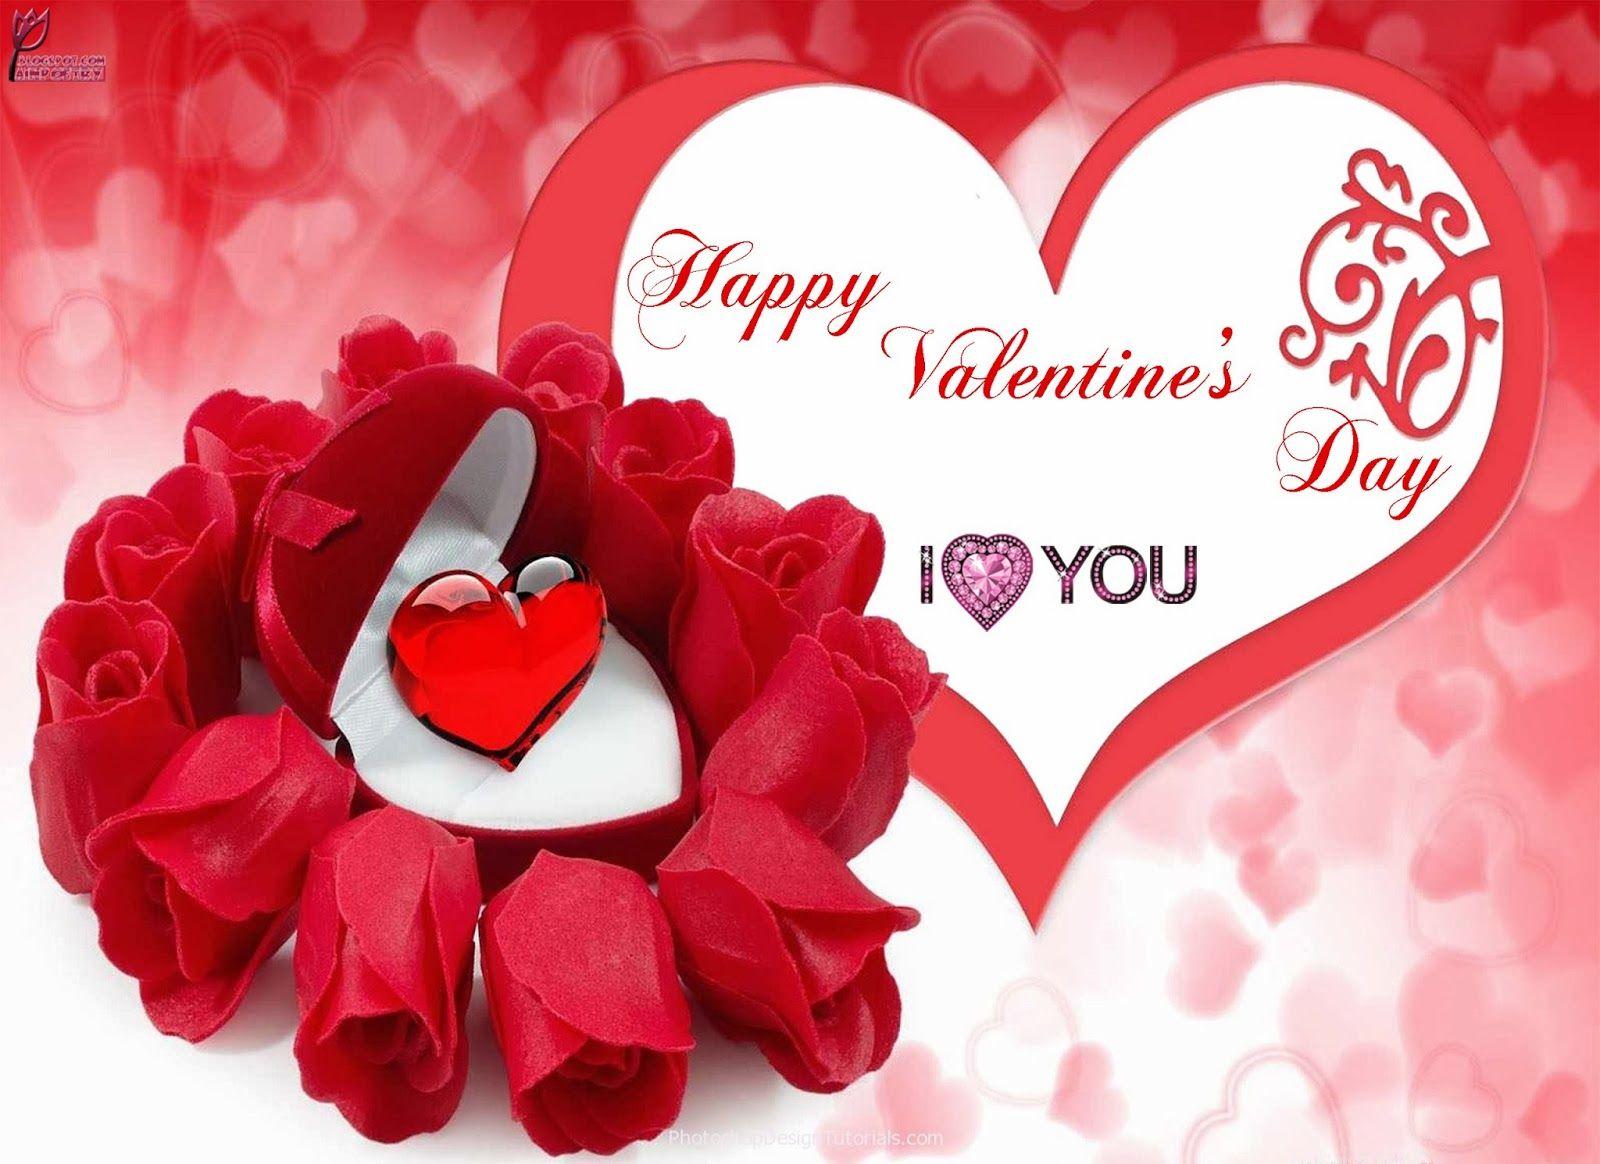 Happy-Valentines-Day-Wallpaper-HD